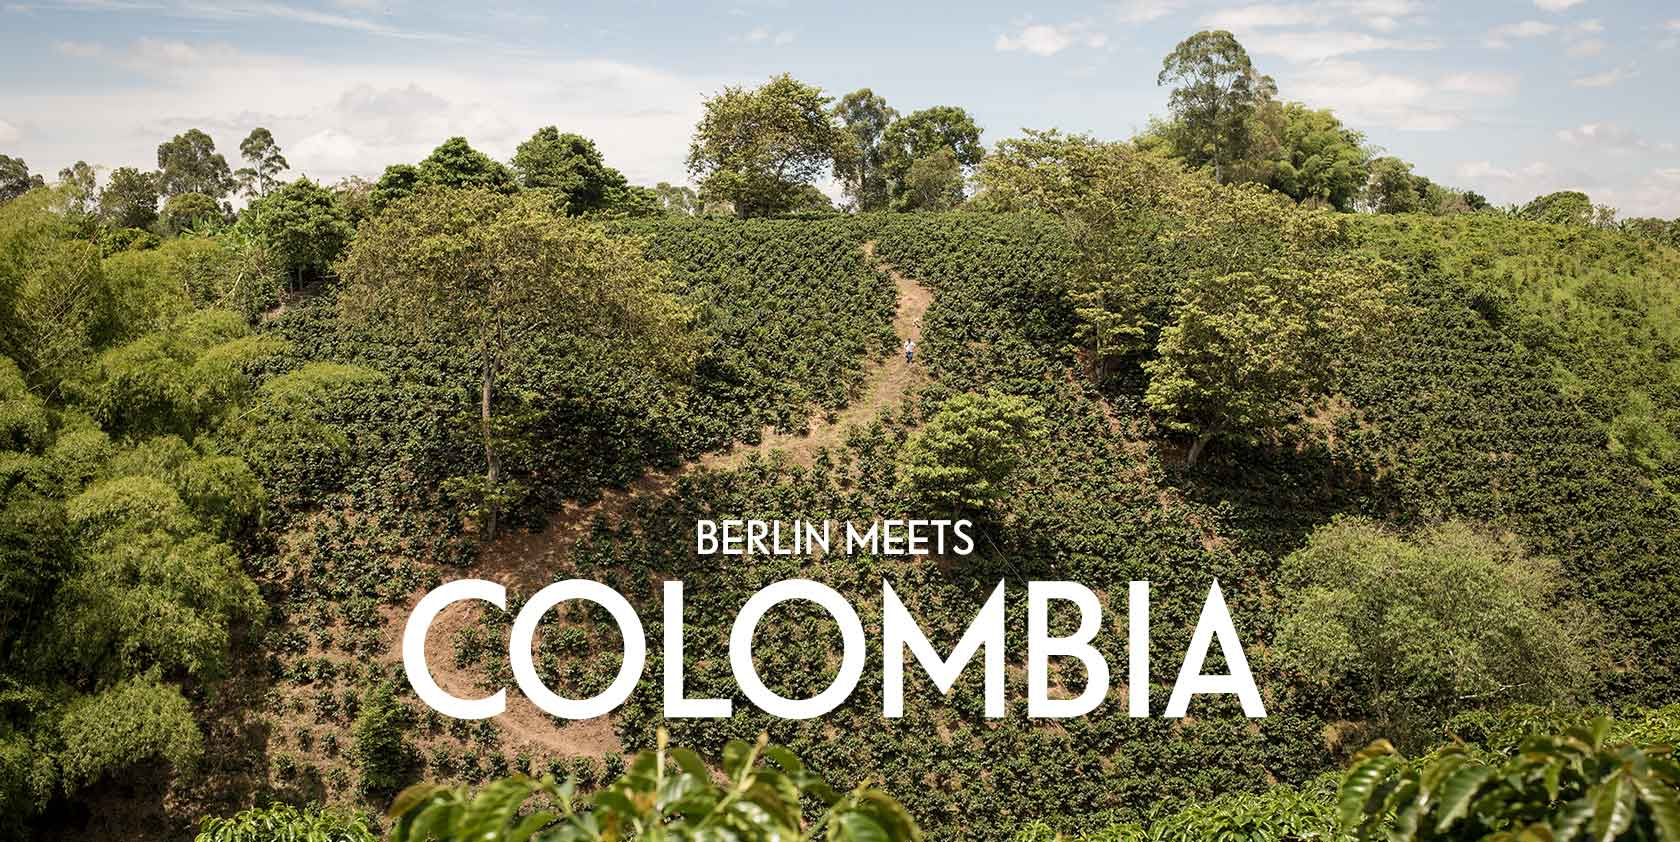 Berlin meets Colombia - Dokumentarfilm für Kaffee und Kolumbien. CafCaf – Kaffee & Blog, Kaffeeblog